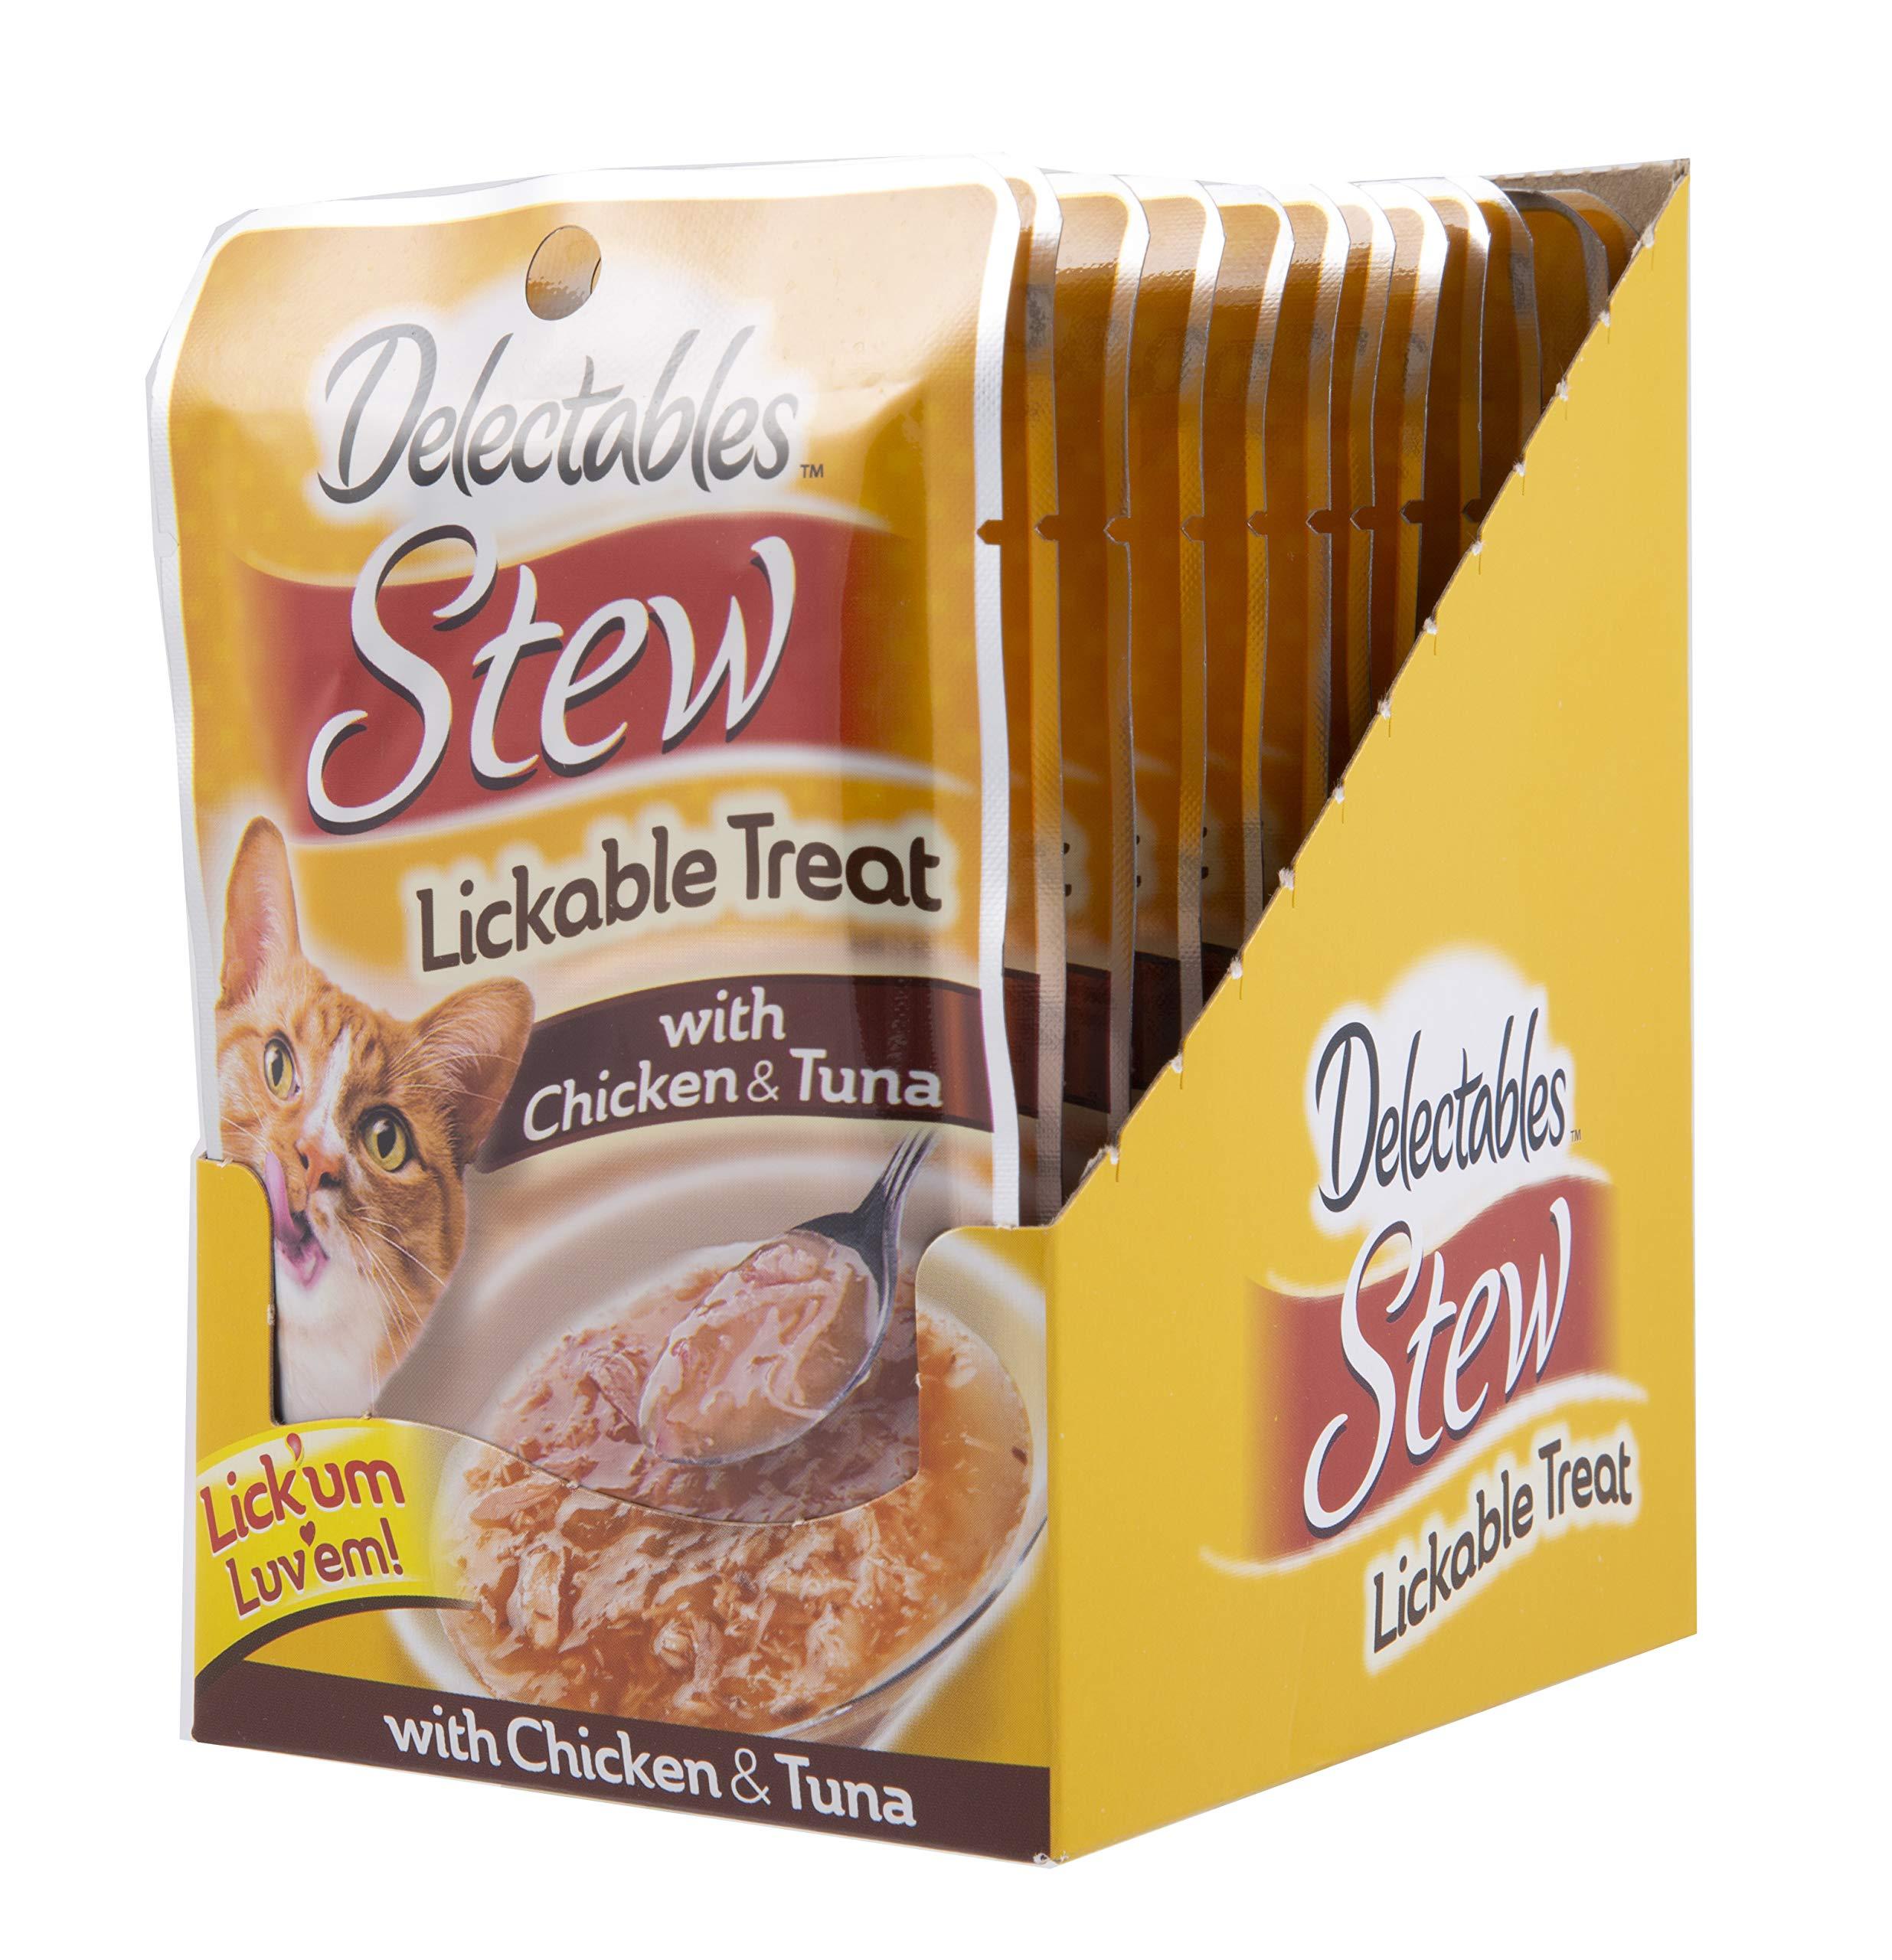 Delectables Stew Chicken & Tuna Lickable Cat Treat, 1.4-oz, case of 12